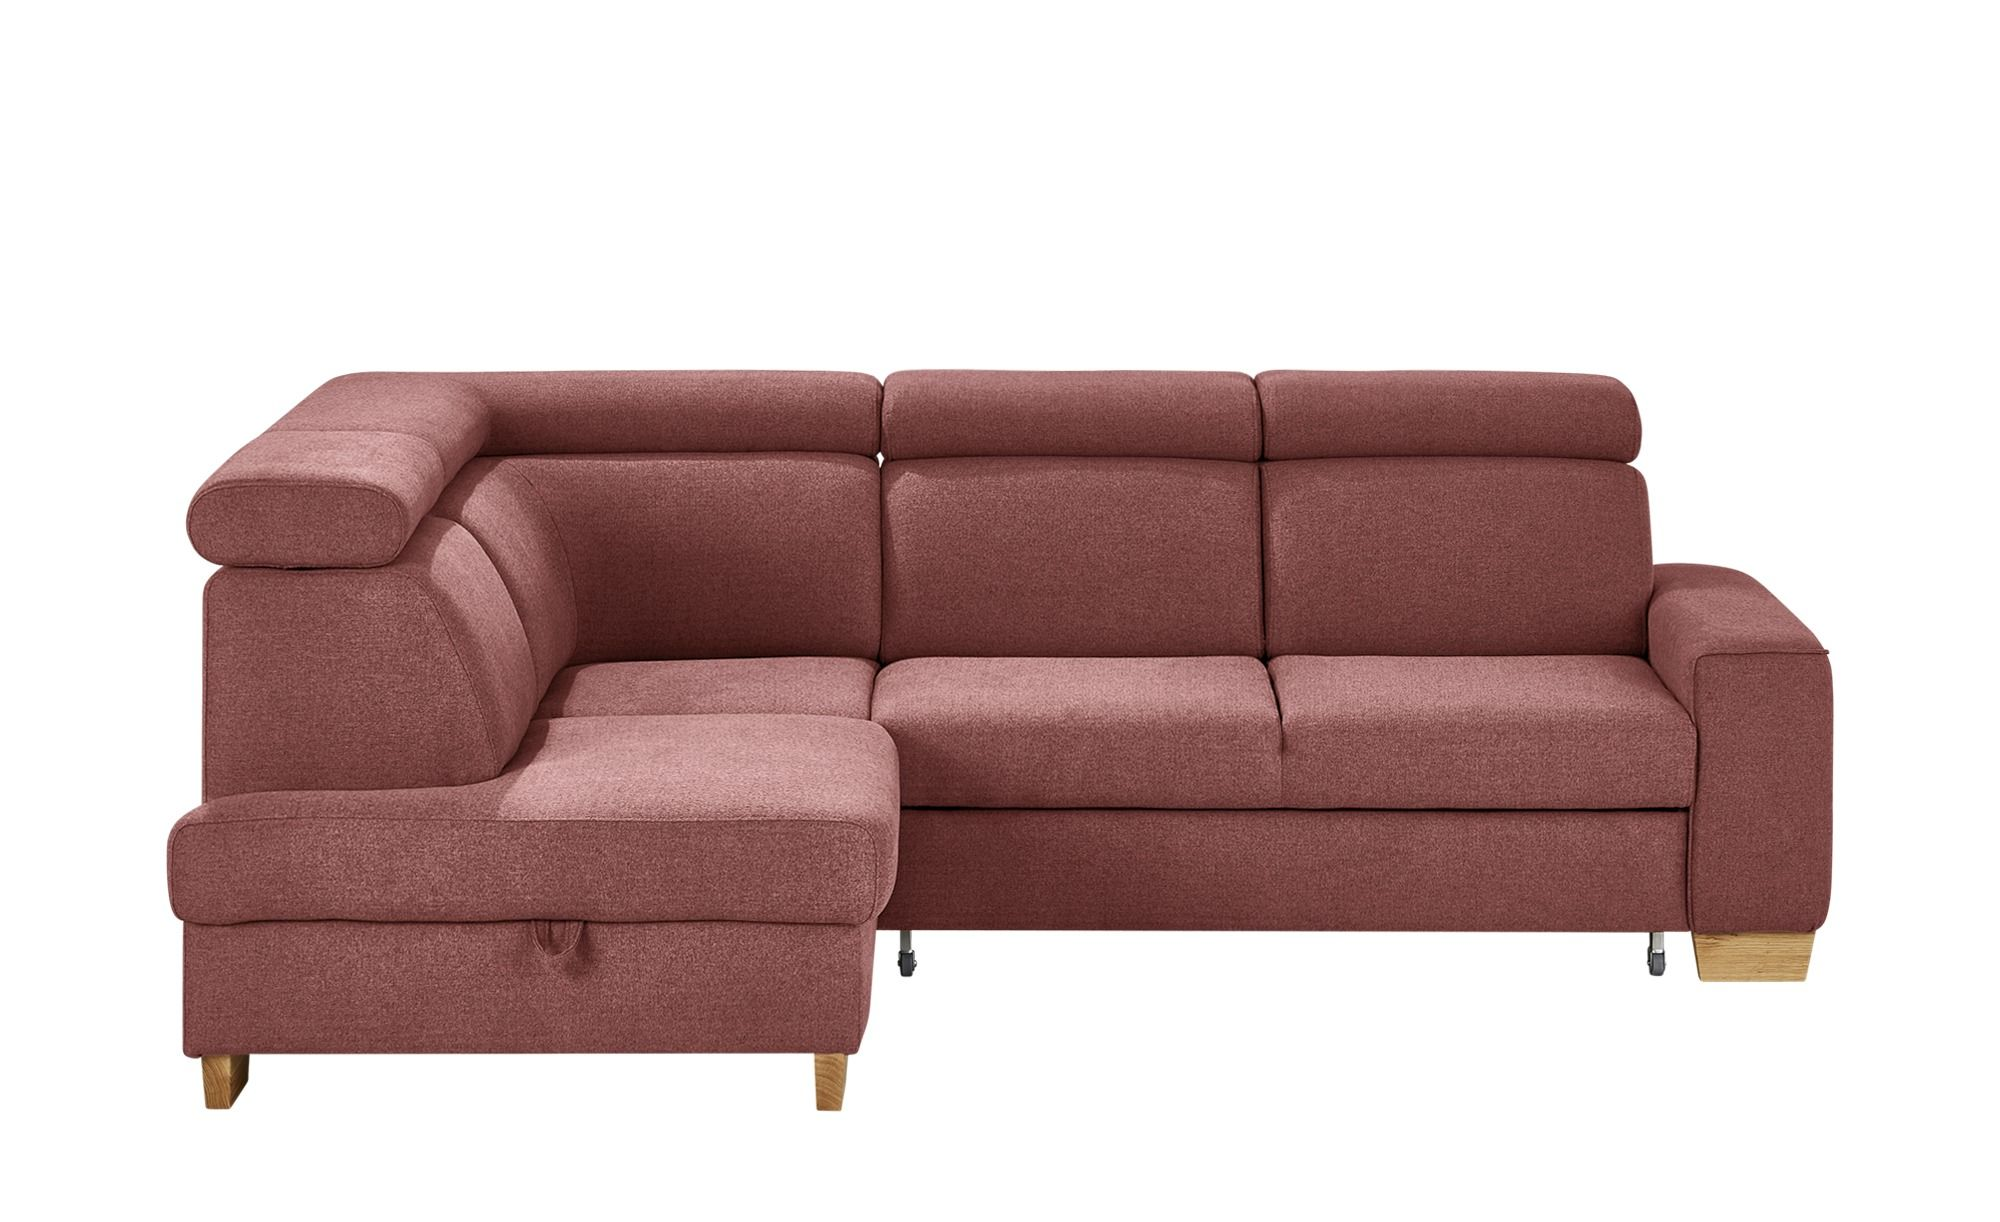 Switch Ecksofa Bardo Gefunden Bei Mobel Hoffner Design Schlafsofa Big Sofa Kaufen Und Ecksofa